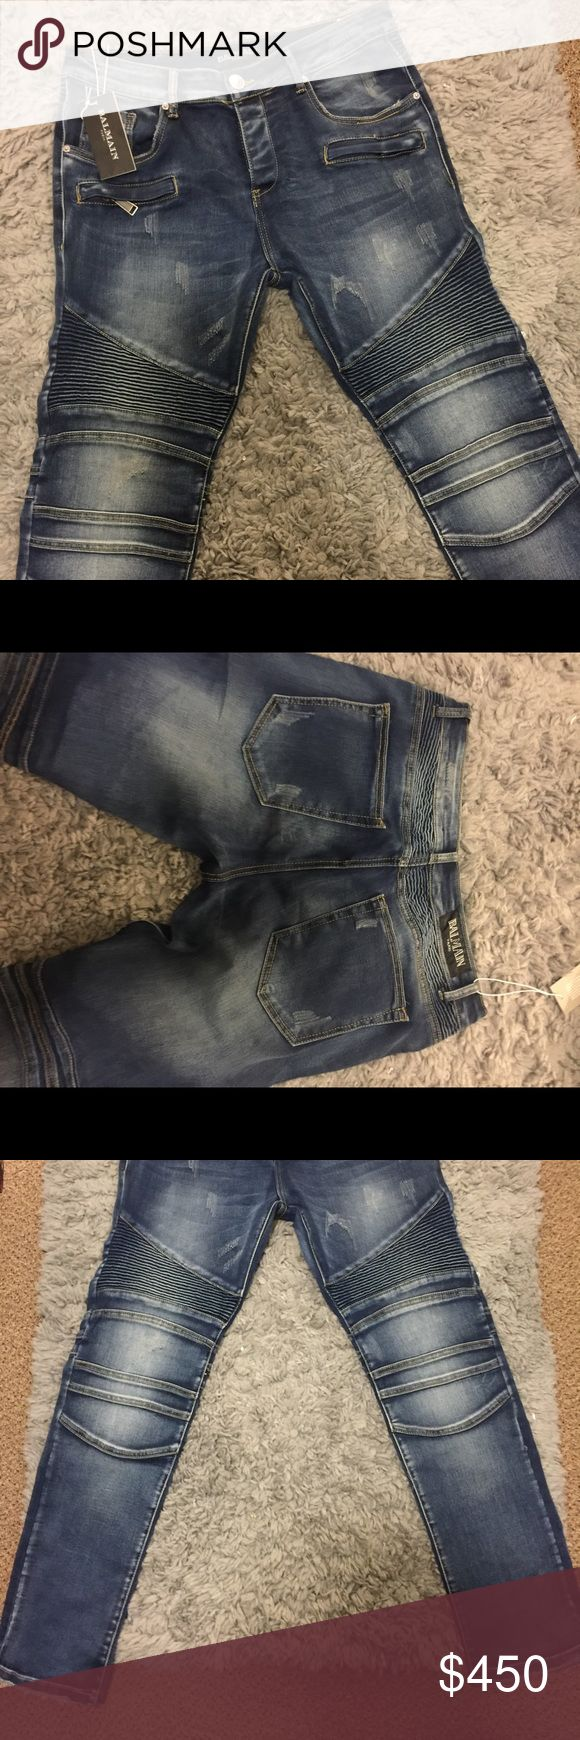 100% genuine Balmain Jeans Dead stock straight leg Balmain Jeans Sz 34 Balmain Pants